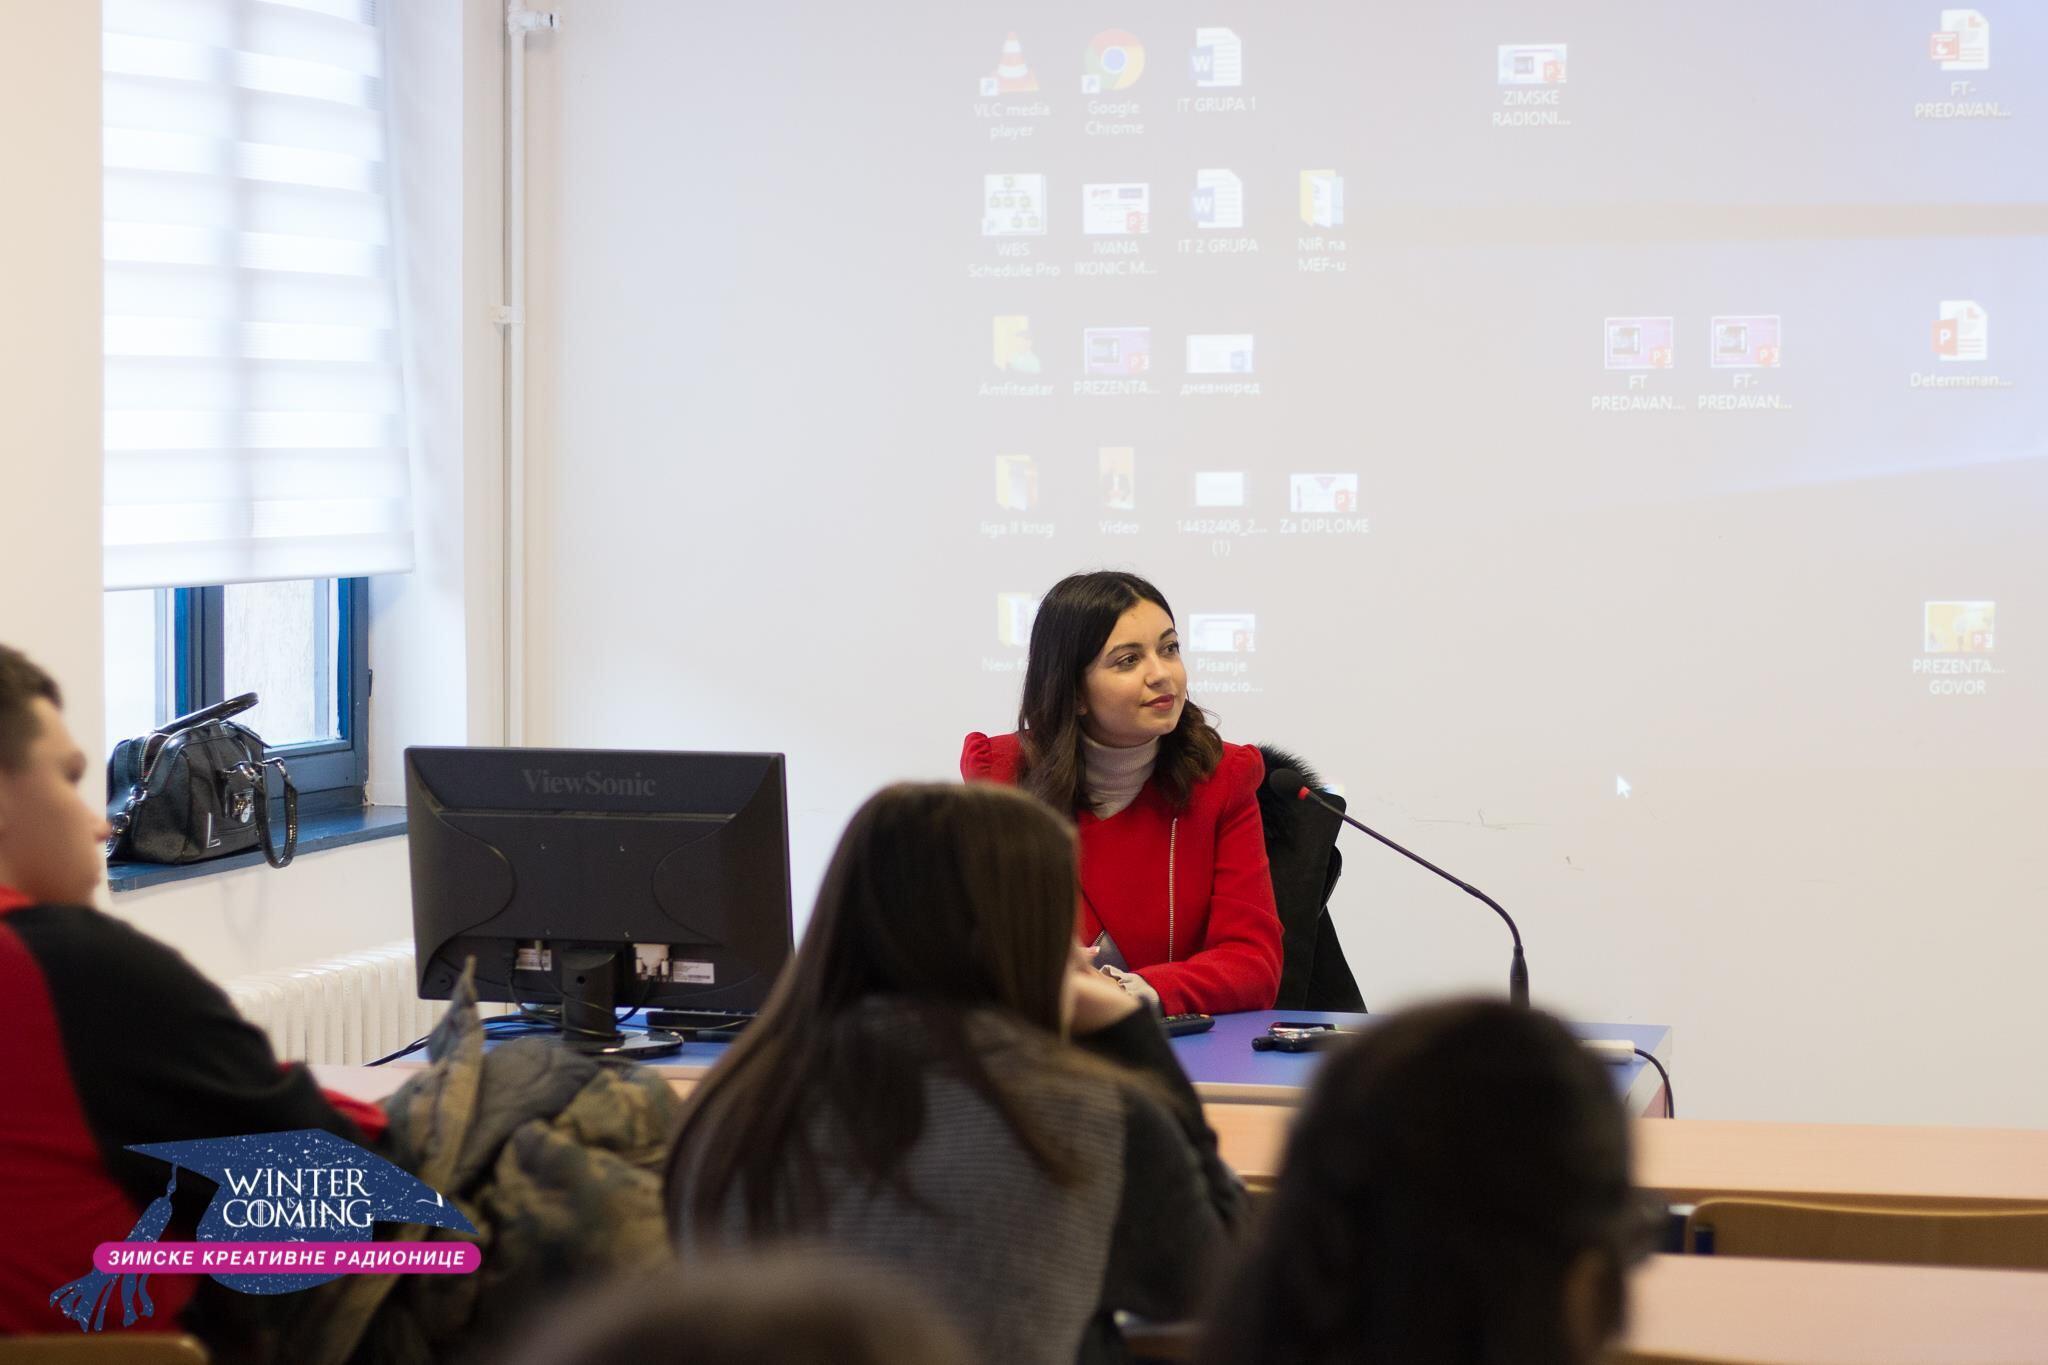 MEF Fakultet - Od konkursa do zaposlenja 3